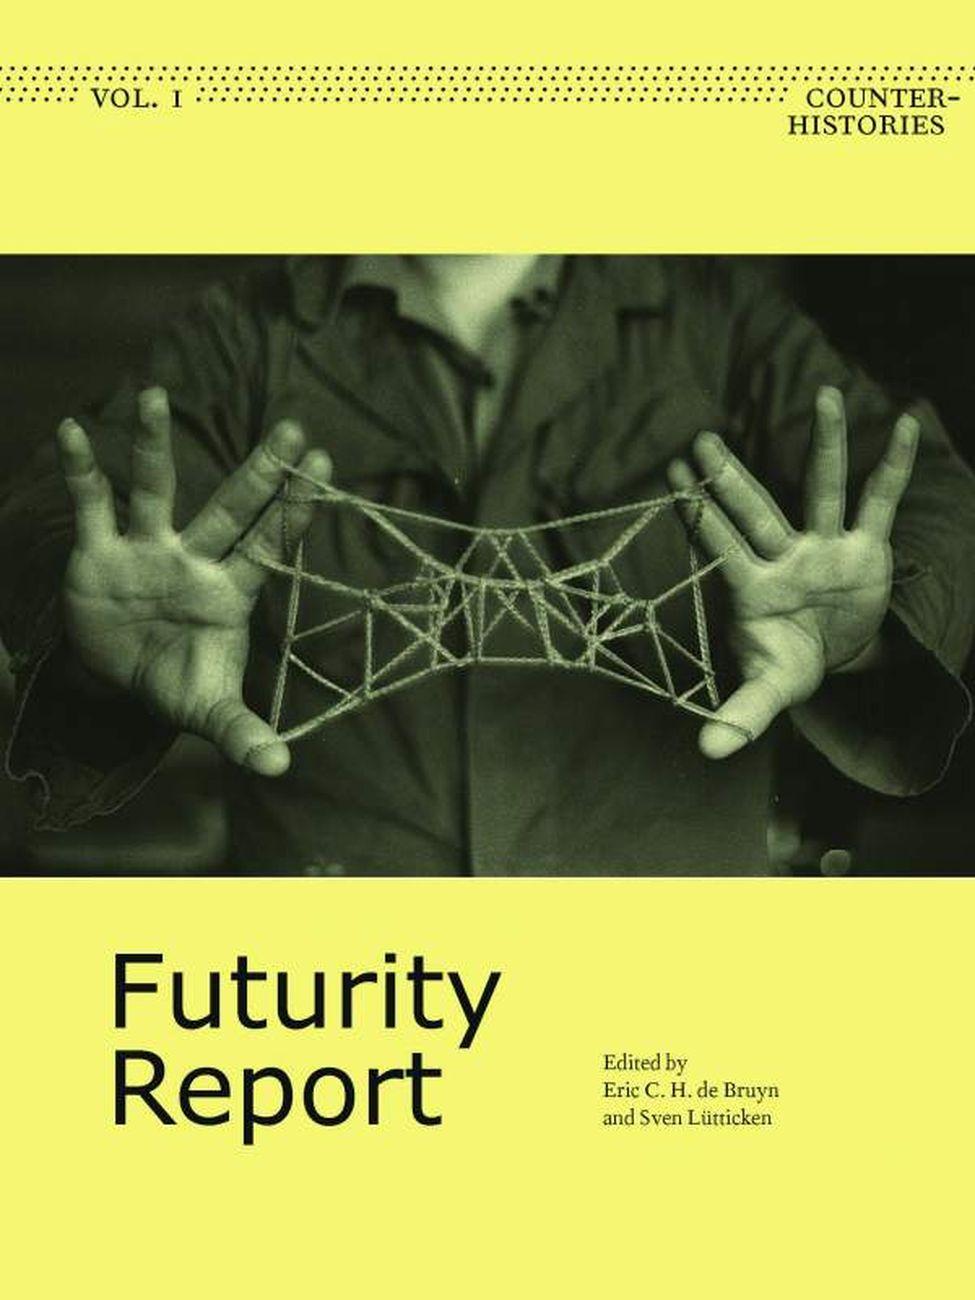 Eric c. h. de Bruyn & Sven Lütticken (a cura di) ‒ Futurity Report. Counter Histories vol. 1 (Sternberg Press, Berlino 2020)